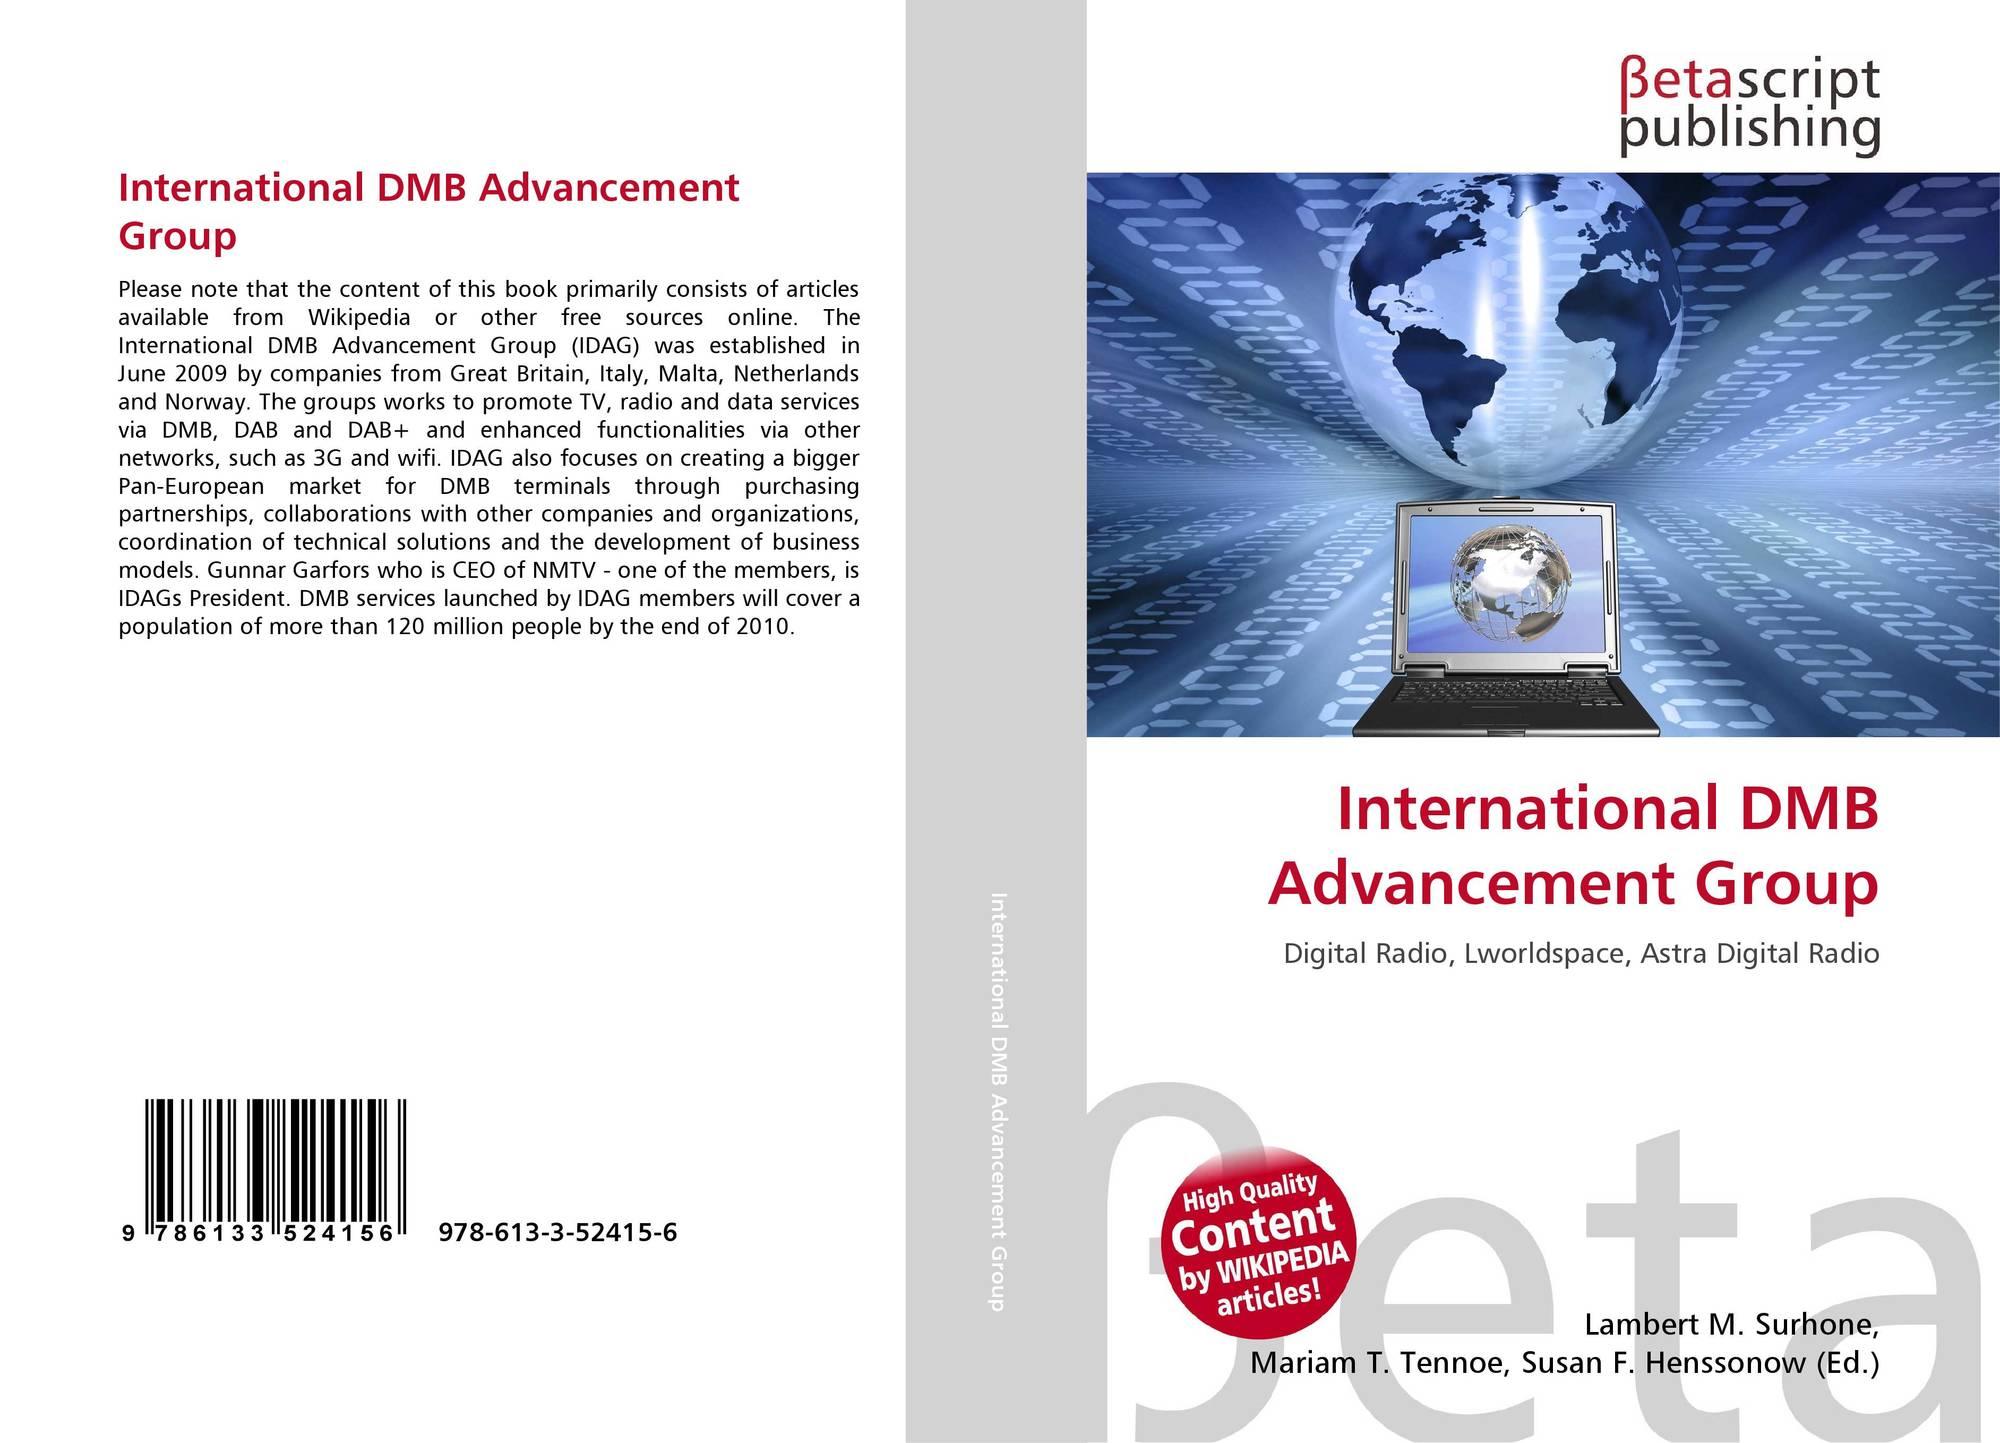 International DMB Advancement Group, 978-613-3-52415-6